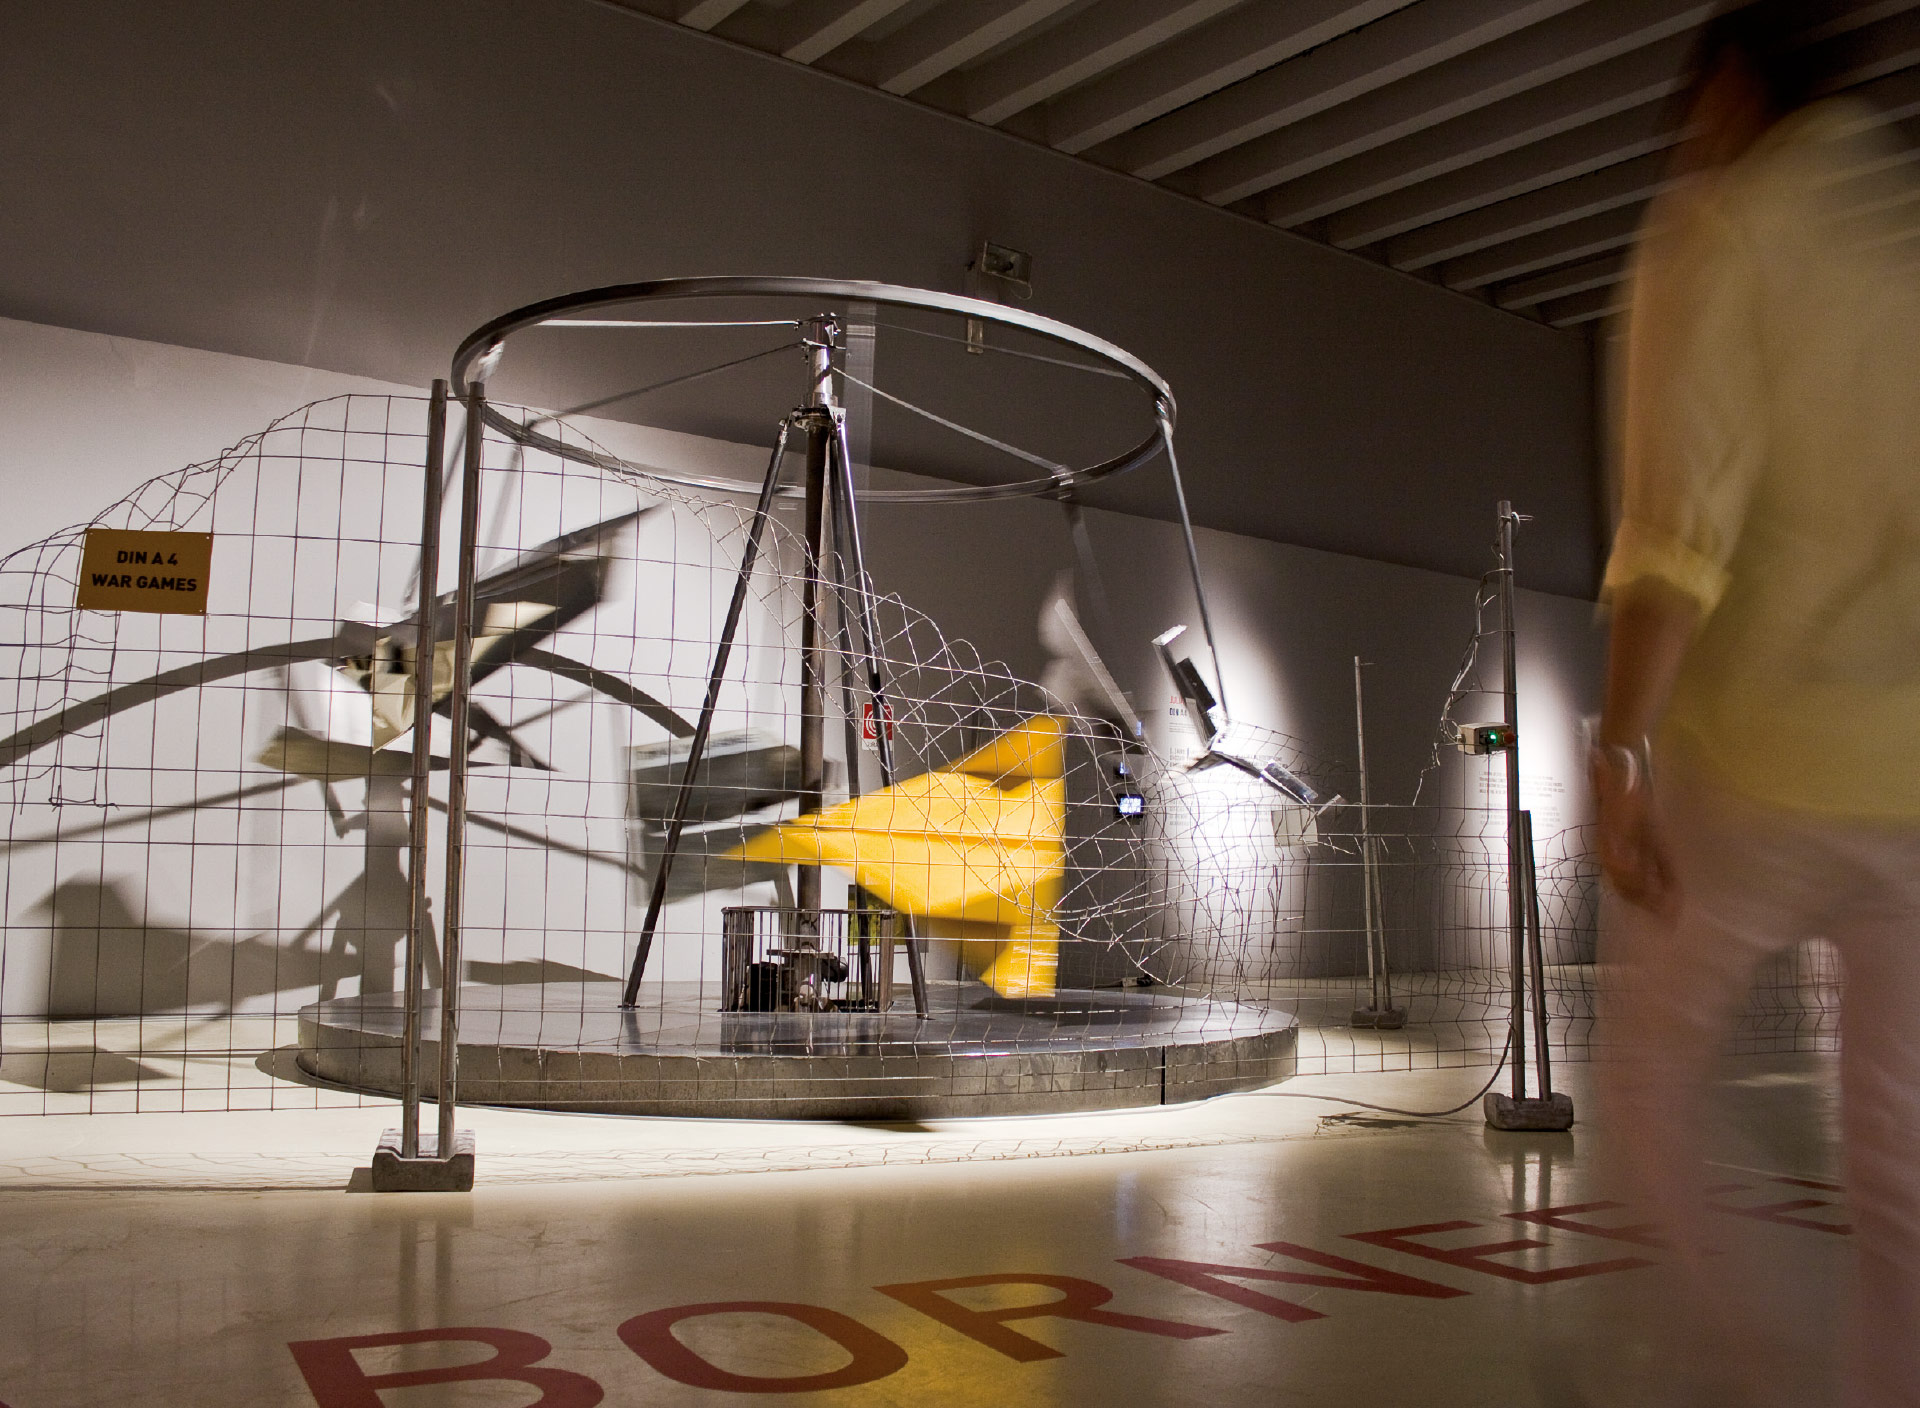 https://www.studiochiesa.it/wp-content/uploads/2021/01/Studio-Chiesa-Steellife-mostra-arte-contemporanea-case-history-09.jpg